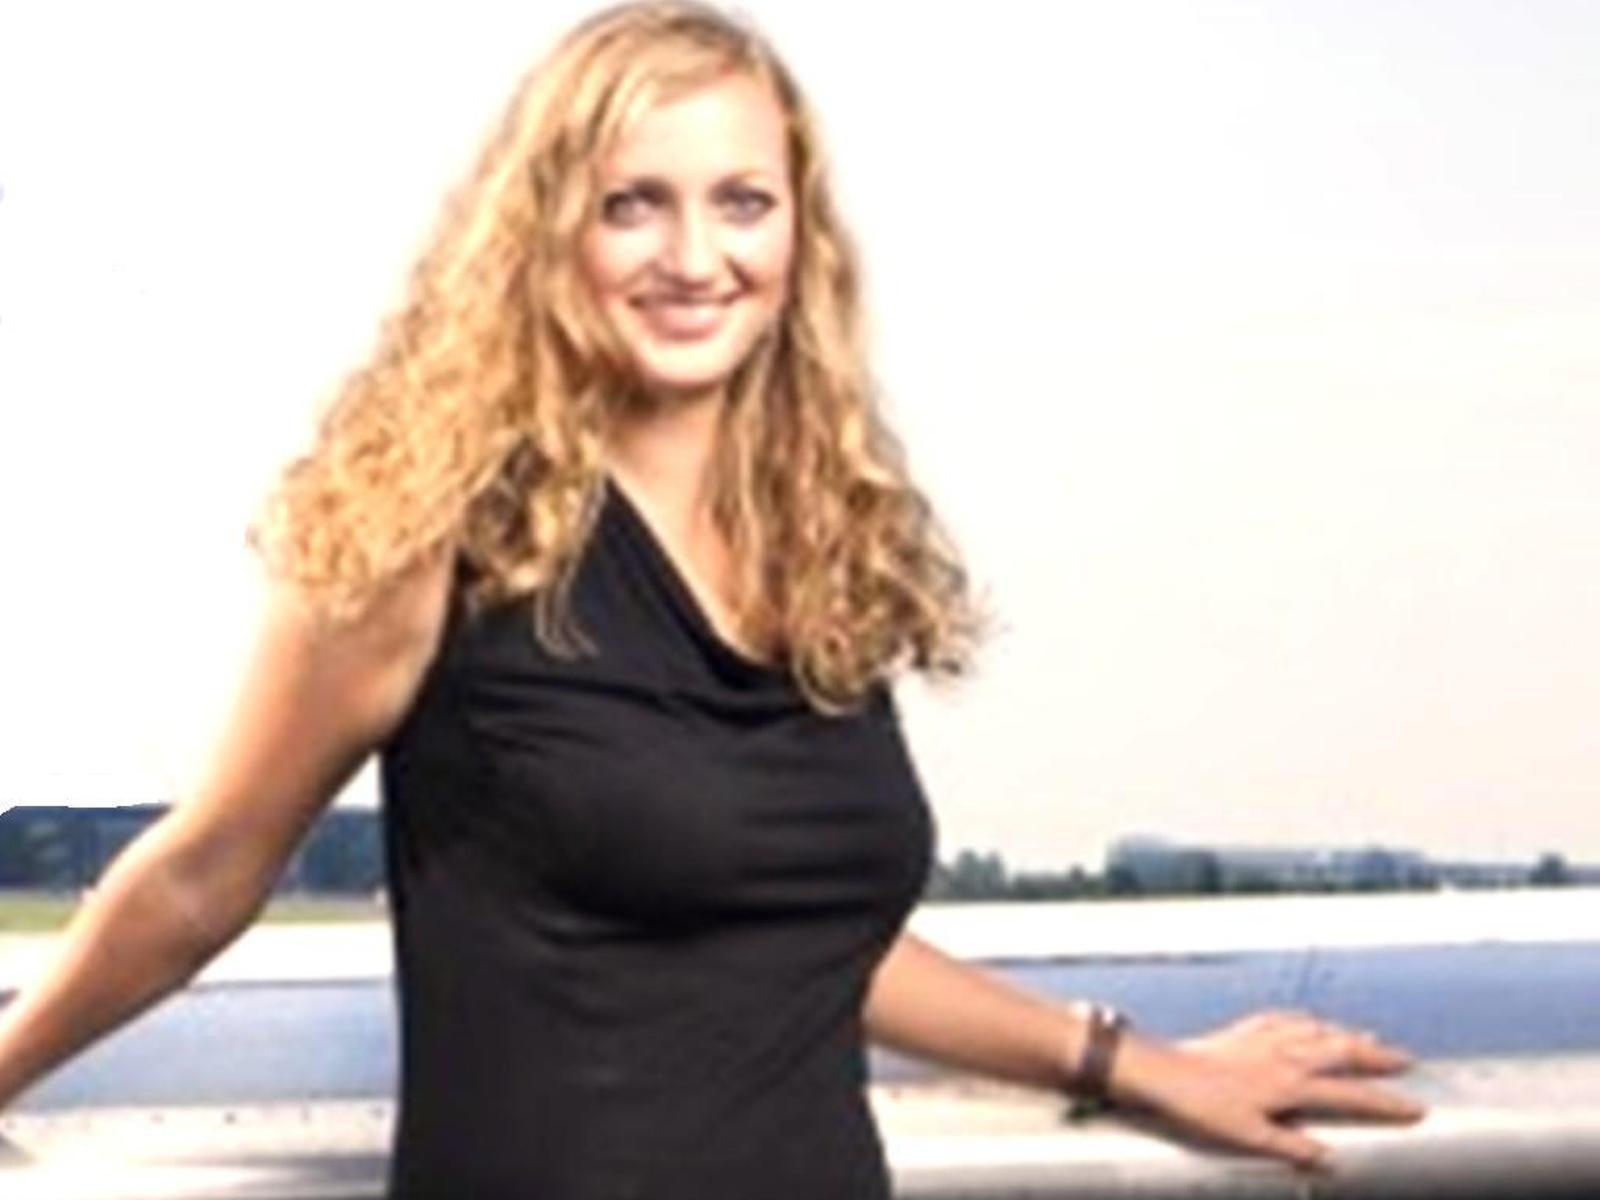 Petra Kvitova Images Breast HD Wallpaper And Background Photos